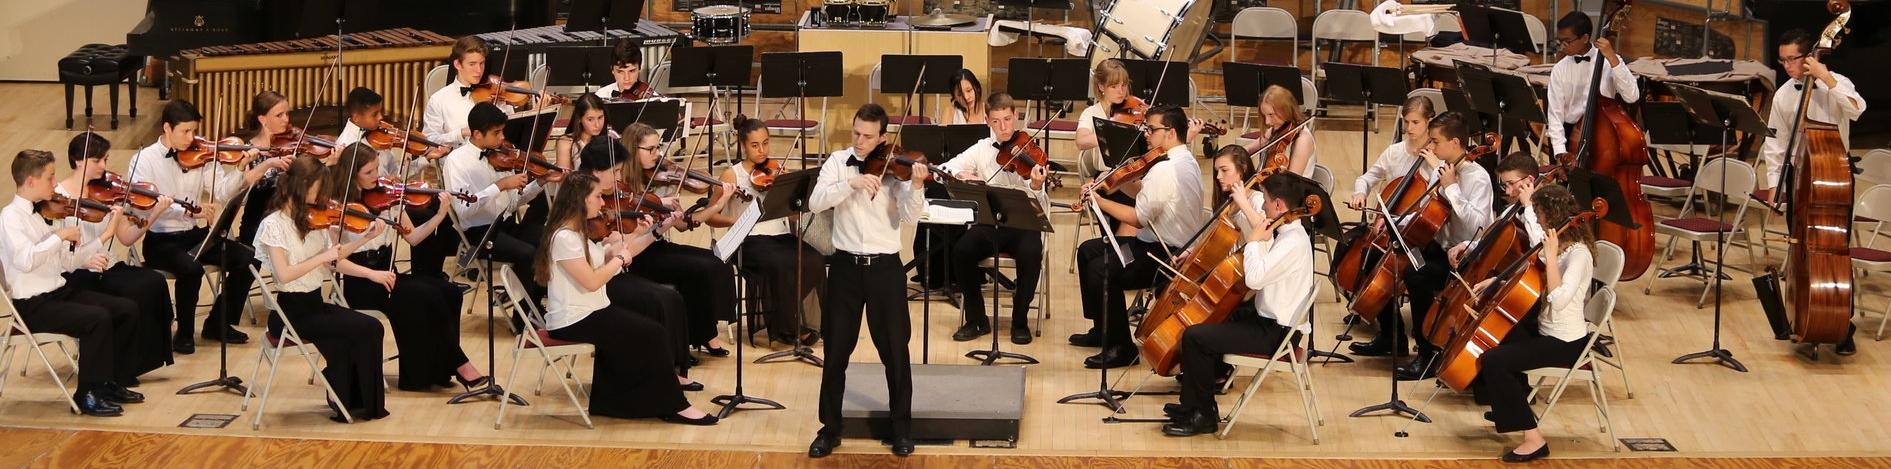 String Orchestra -